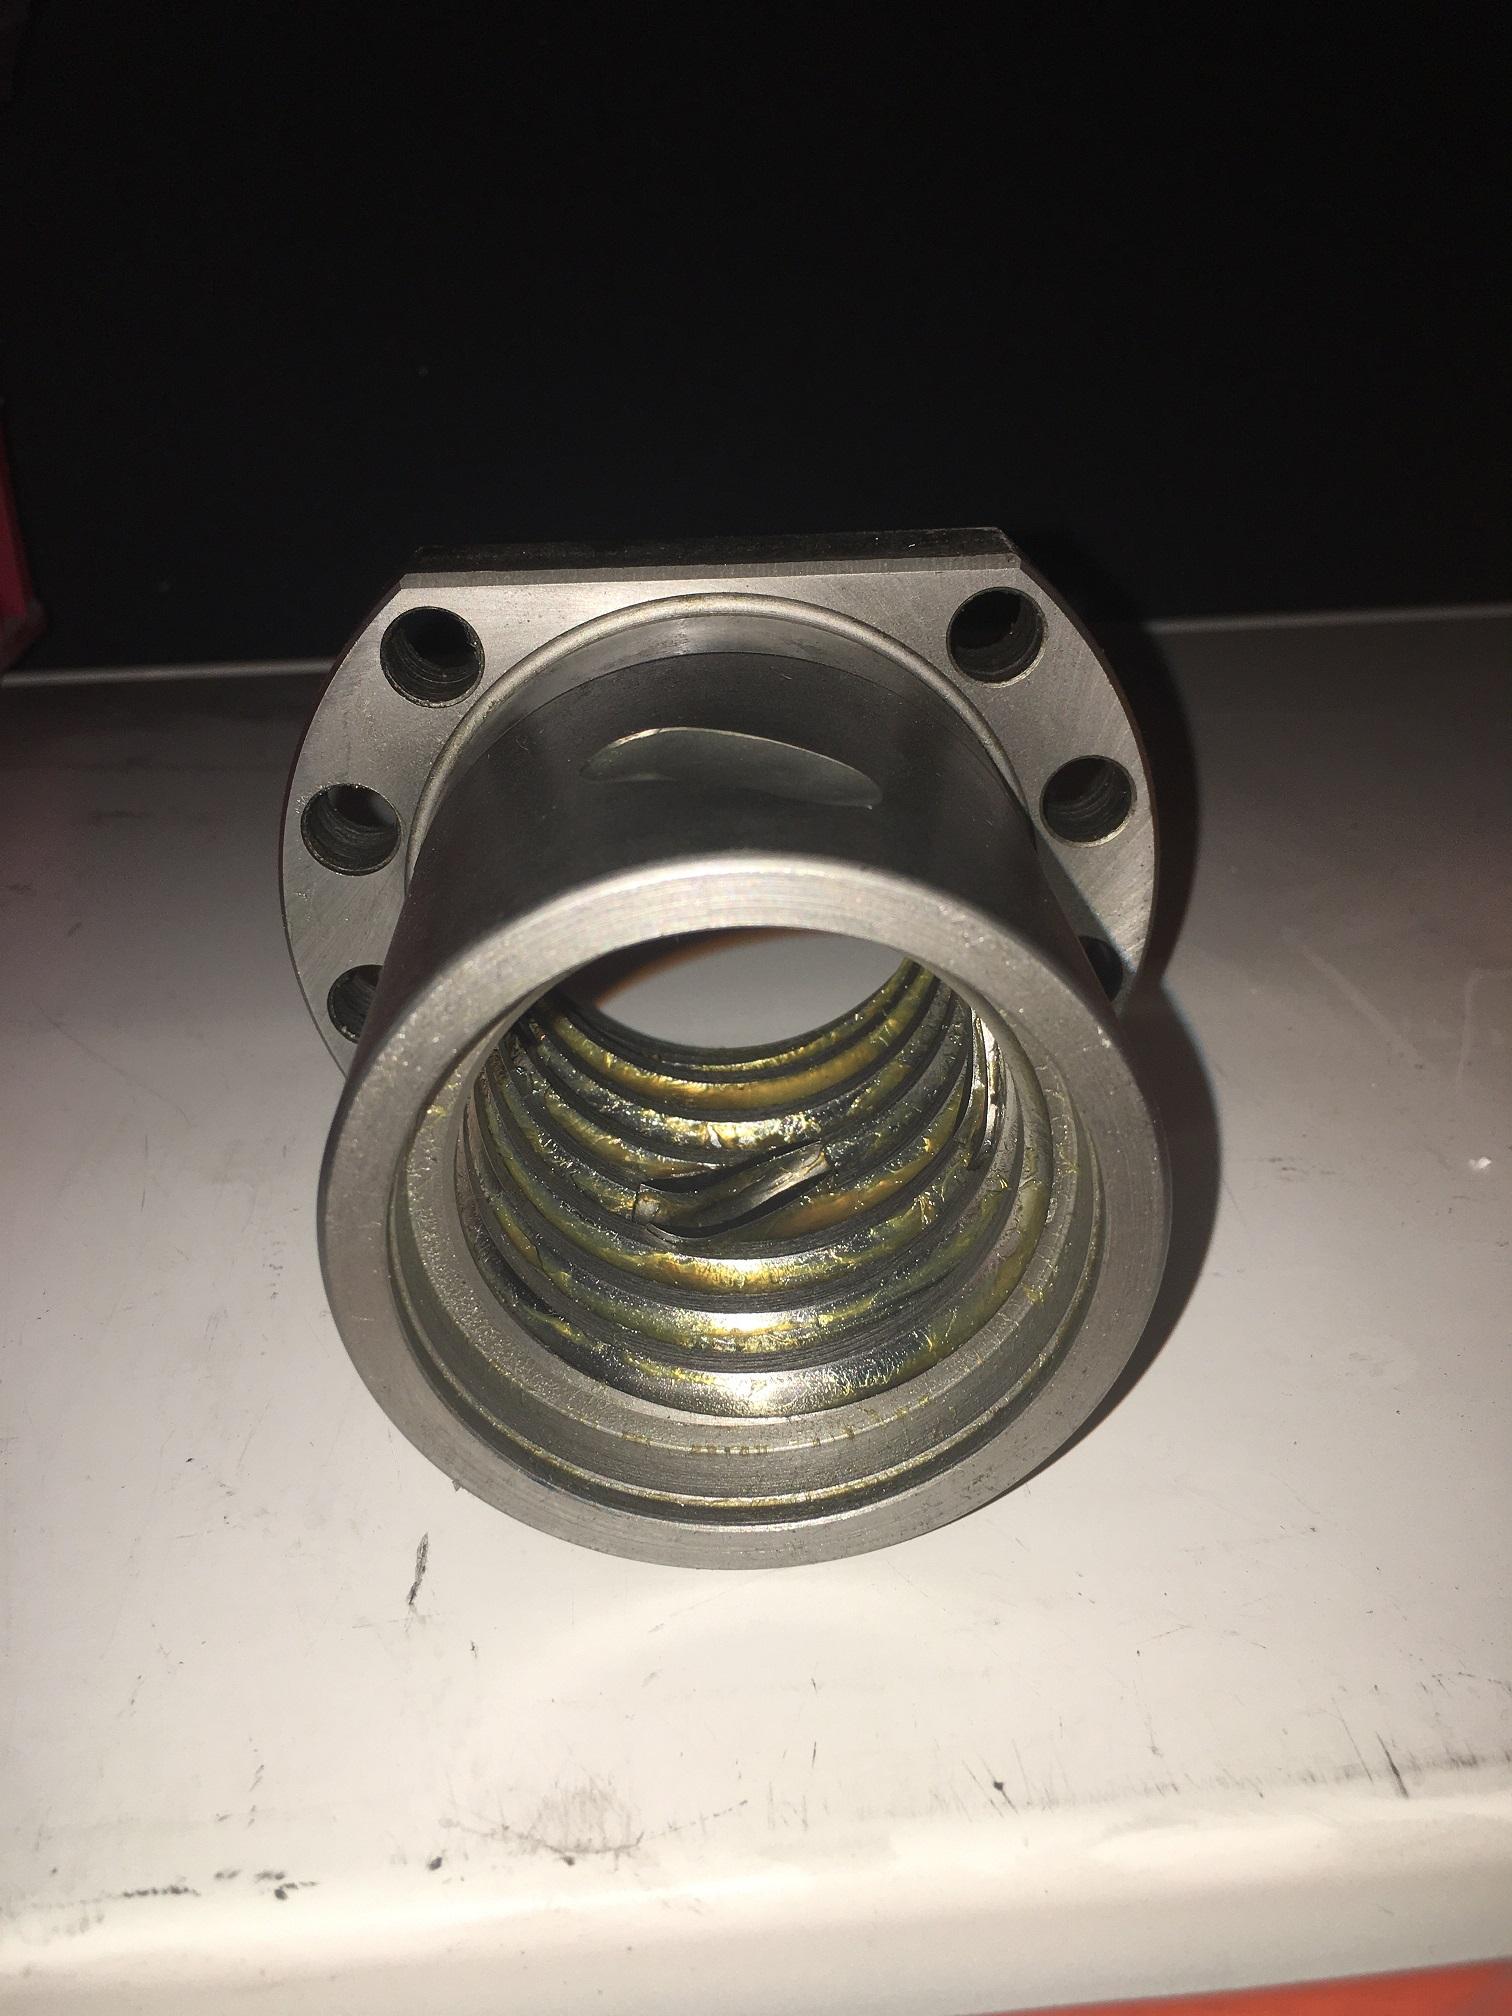 internal view on ball screw nut